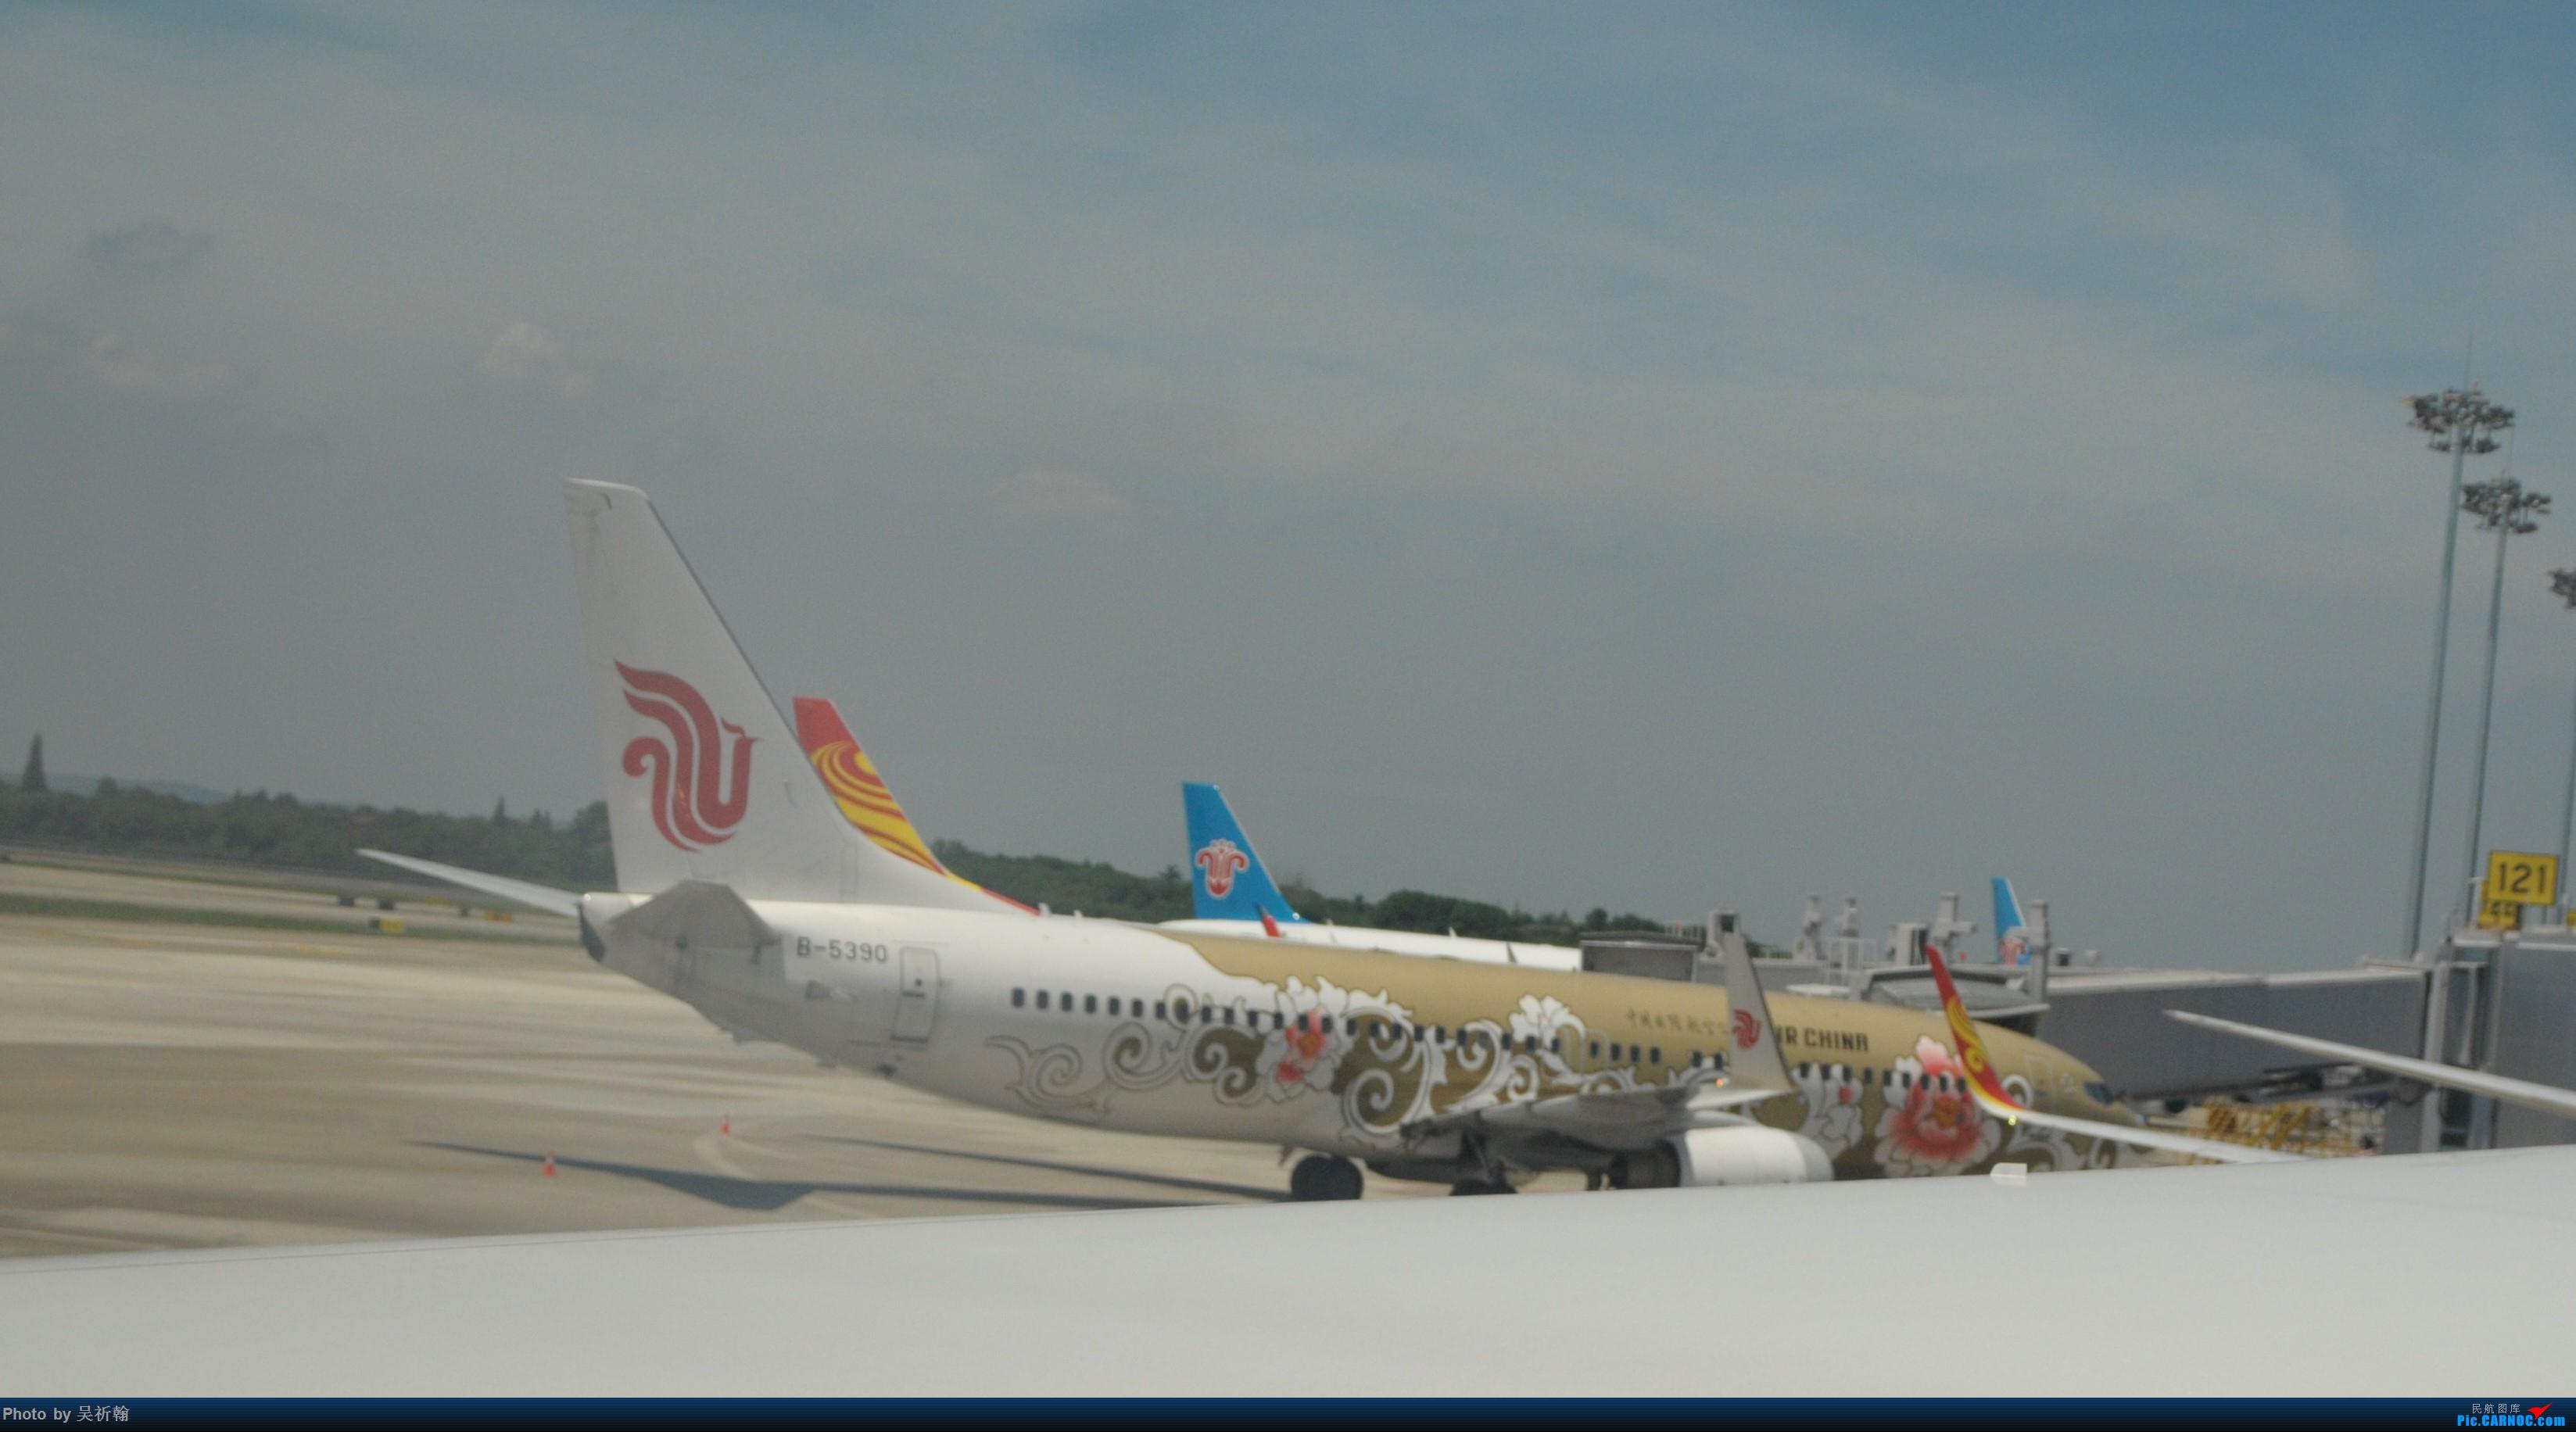 Re:[原创]Kian的飞行游记2:金陵2日游,B787返回广州 BOEING 737-800 B-5390